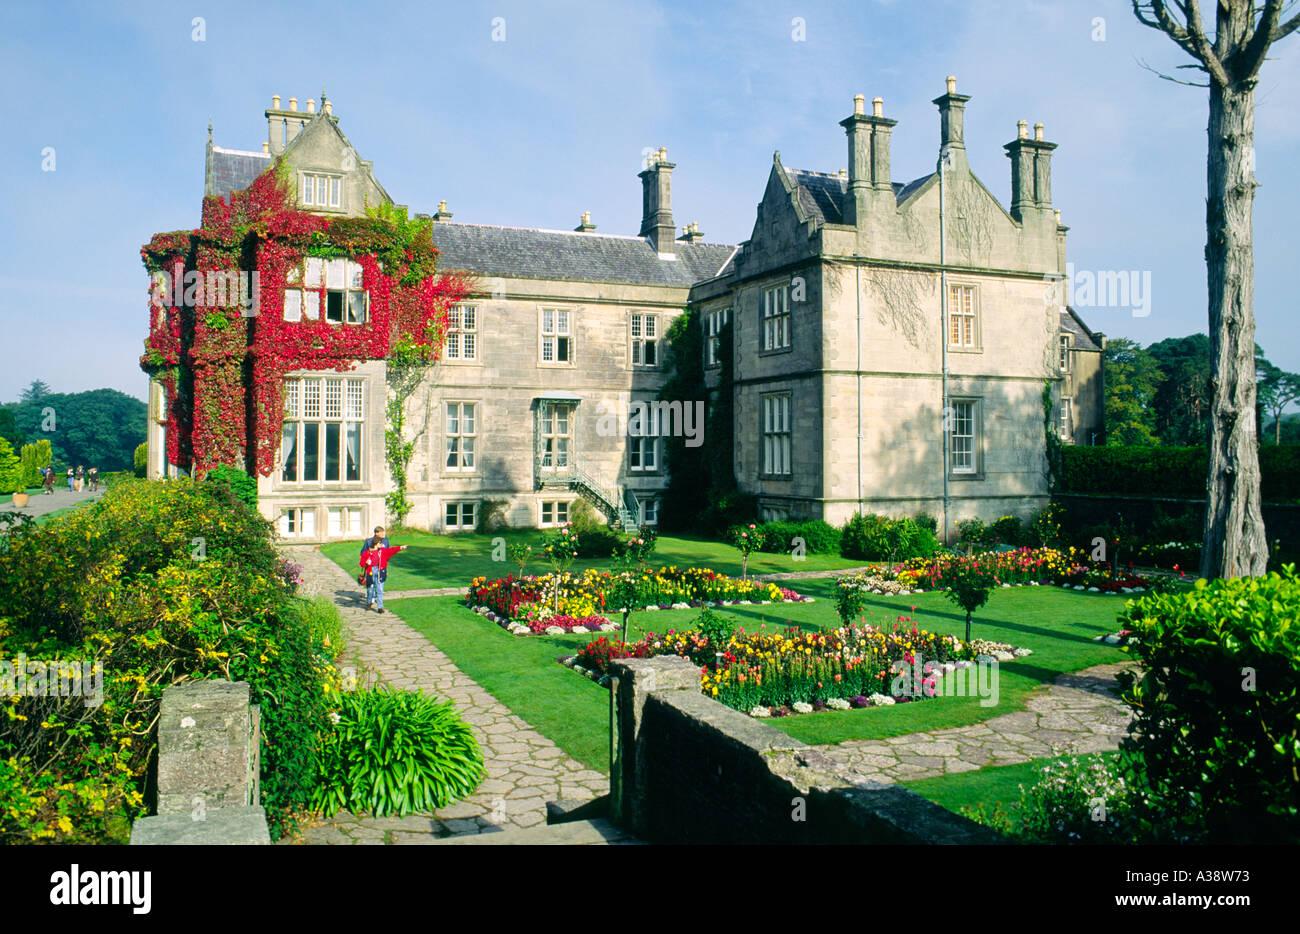 Muckross House on the Lakes of Killarney, County Kerry, Ireland - Stock Image